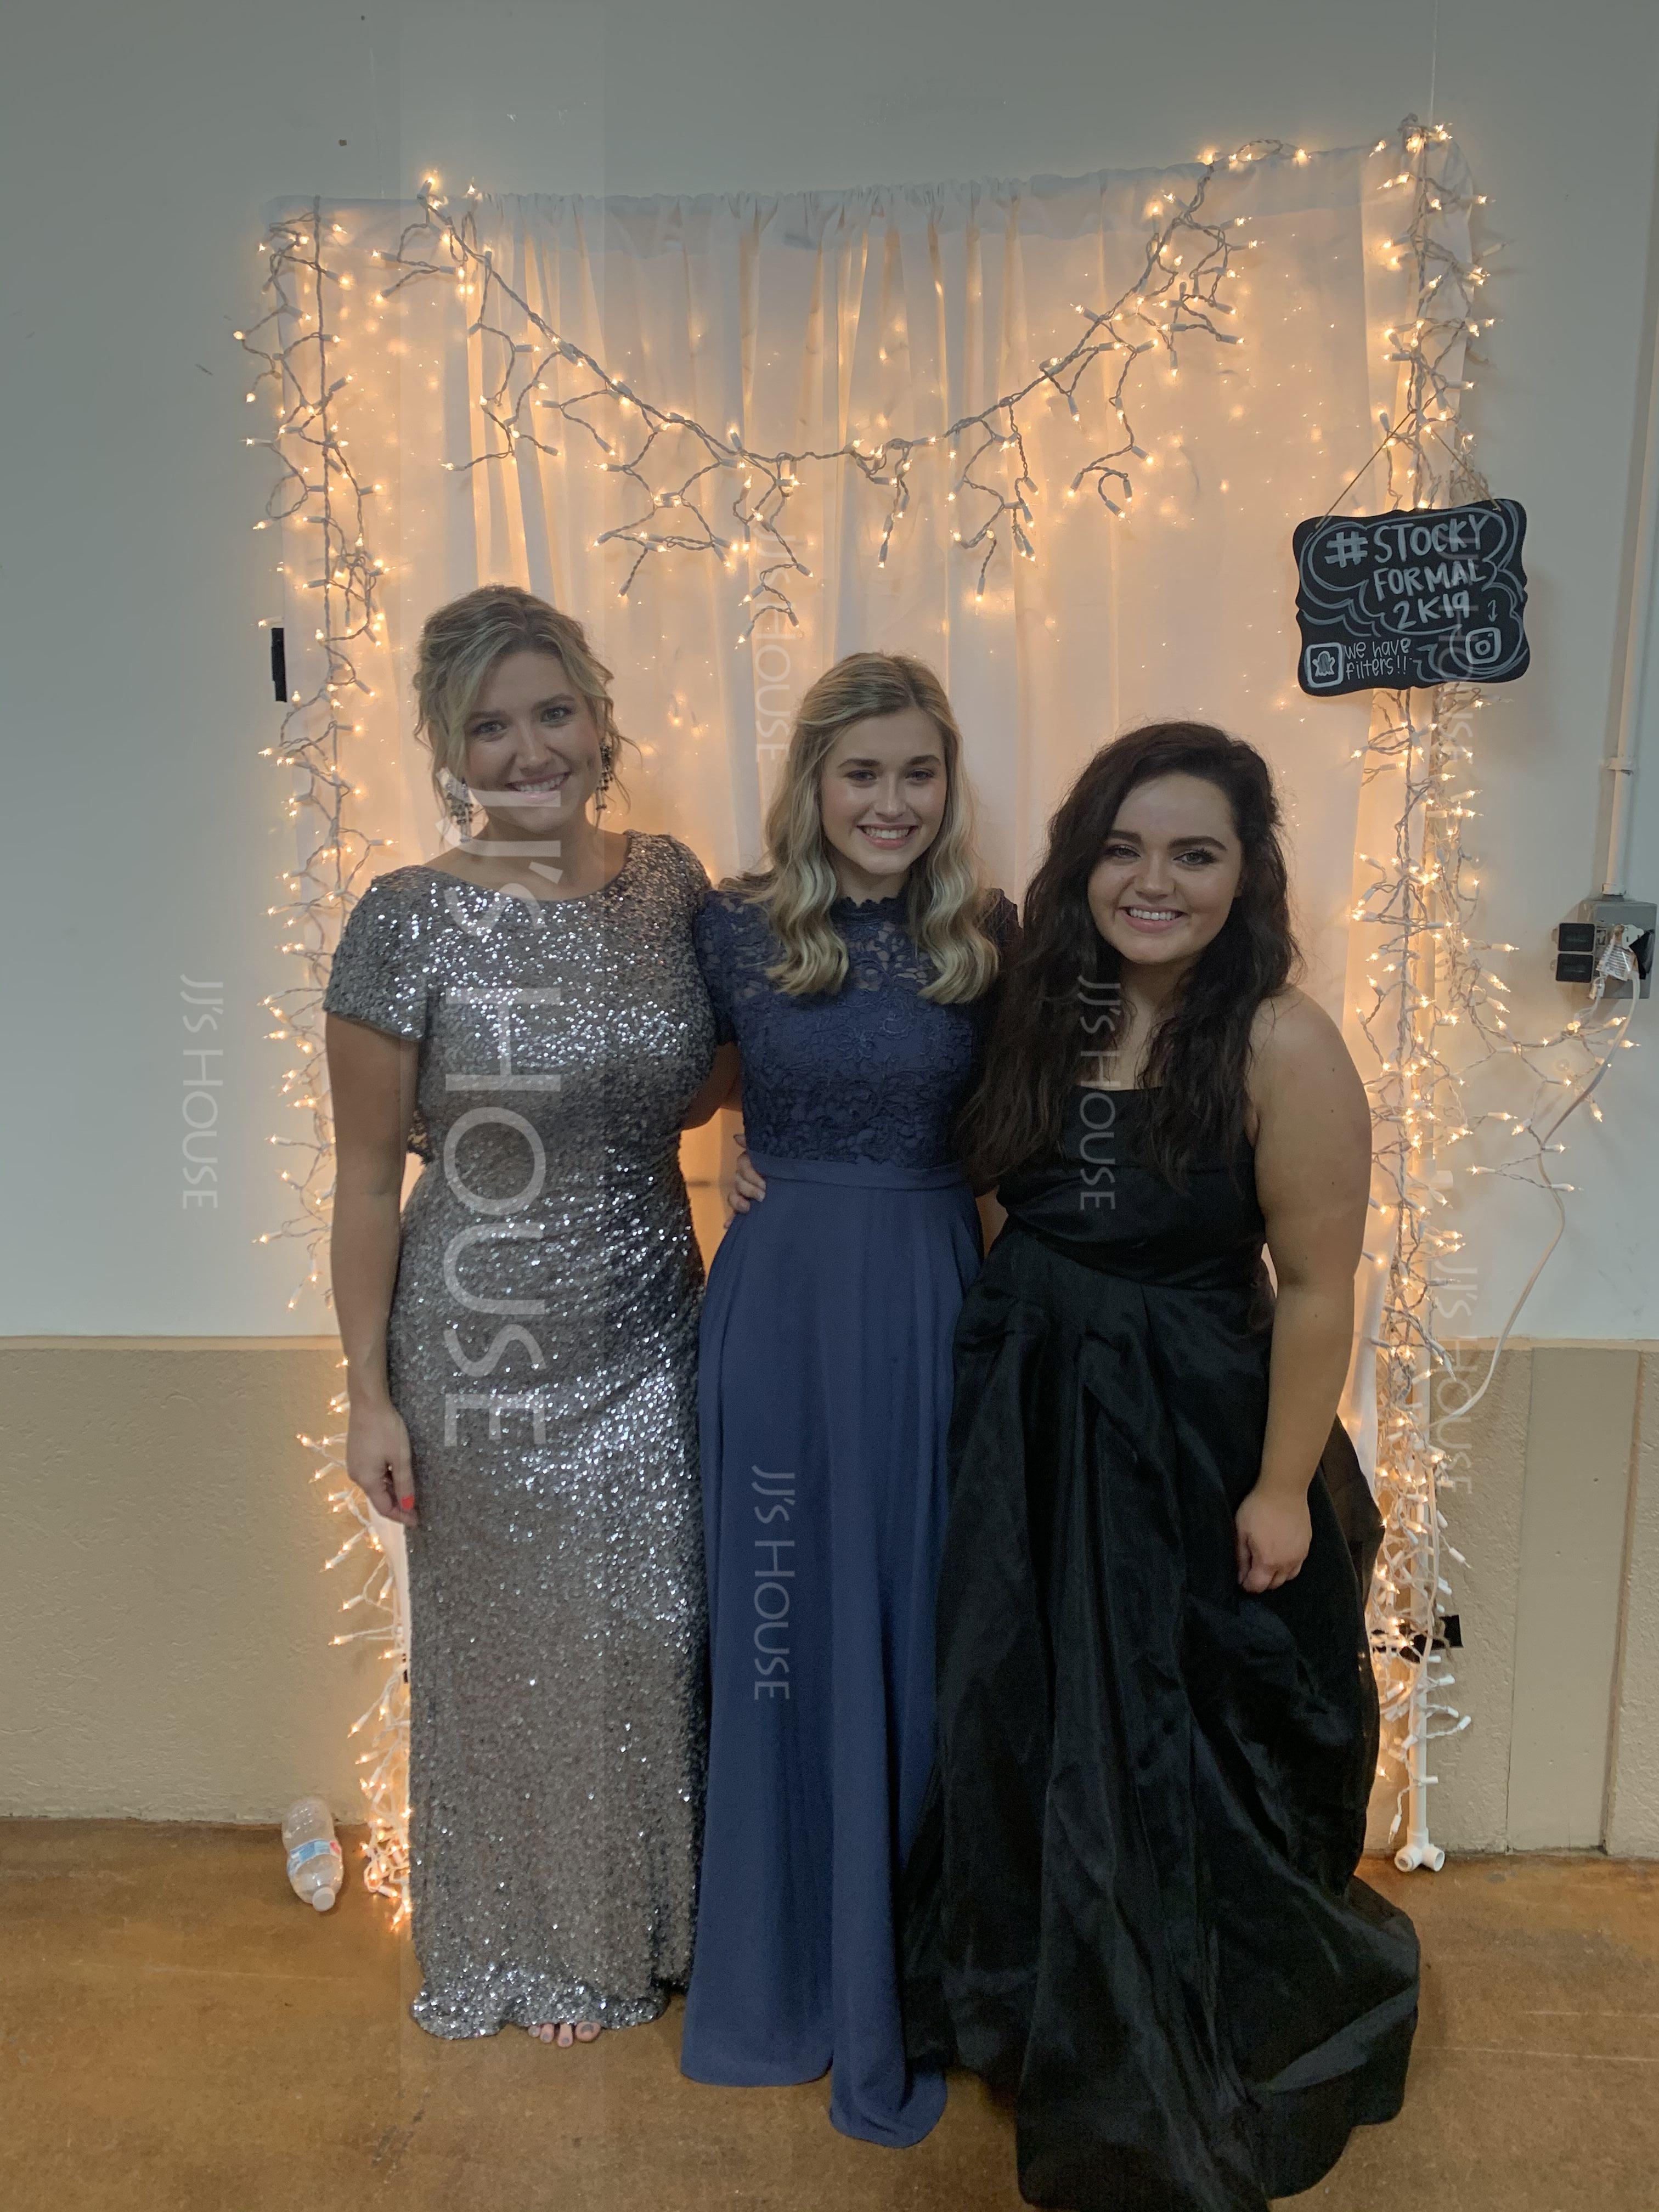 A-Line High Neck Floor-Length Chiffon Prom Dresses (018186892)